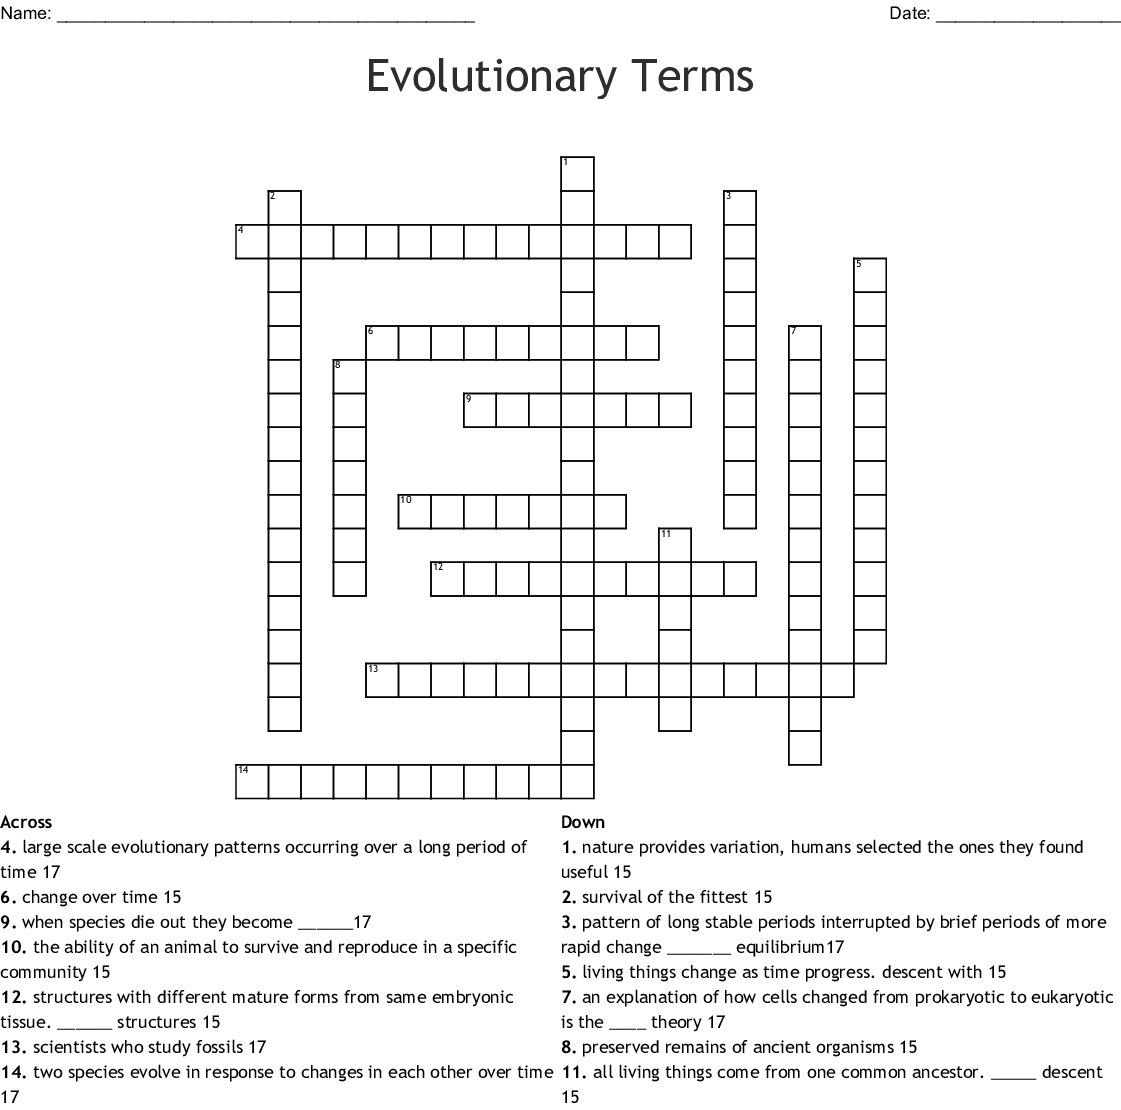 Evolutionary Terms Crossword